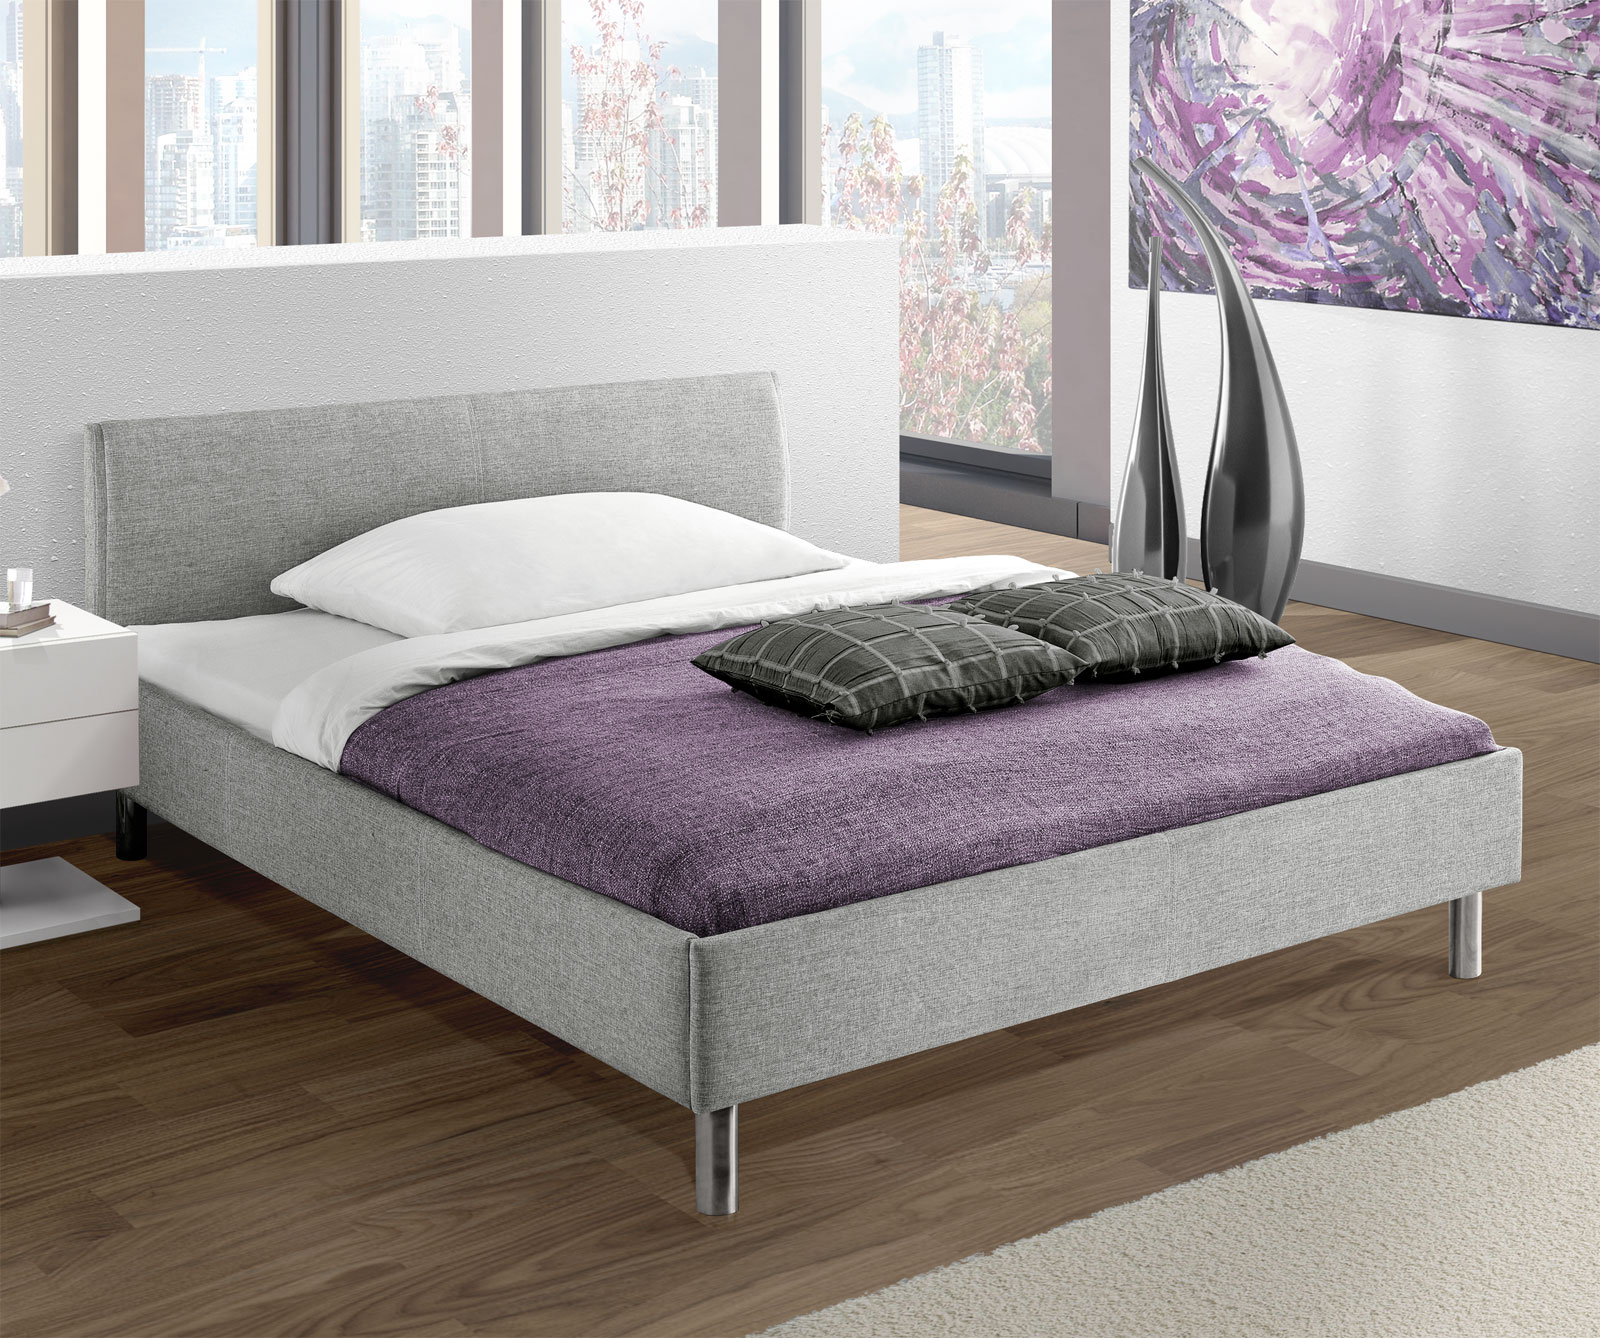 preiswertes graues polsterbett in 140x200 cm gravelines. Black Bedroom Furniture Sets. Home Design Ideas